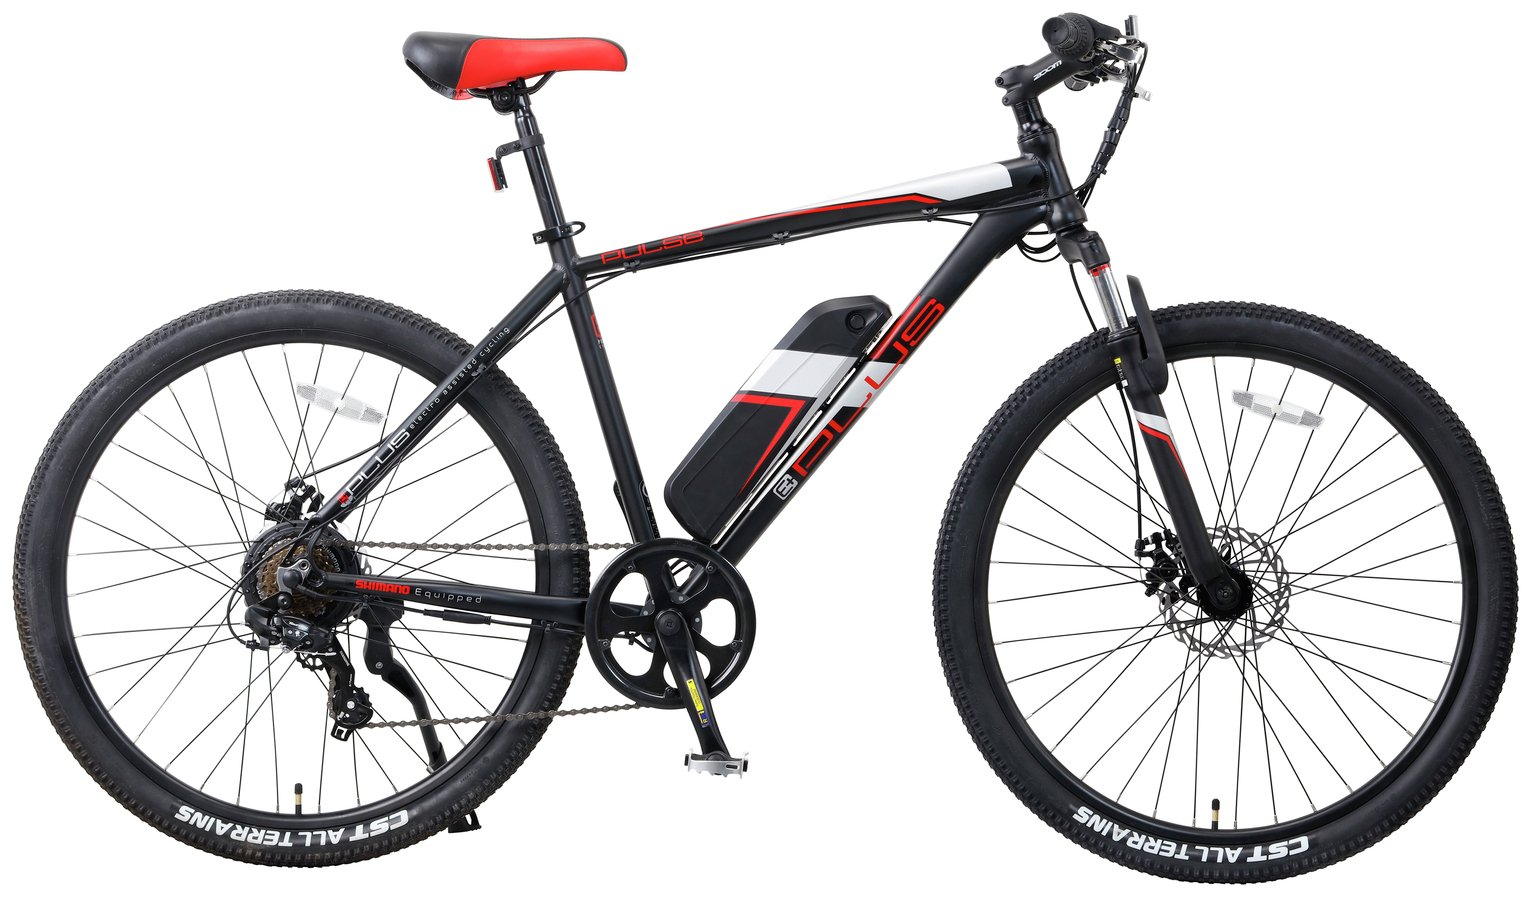 Image of E-Plus Pulse 27.5 Inch 36V Electric Mountain Bike